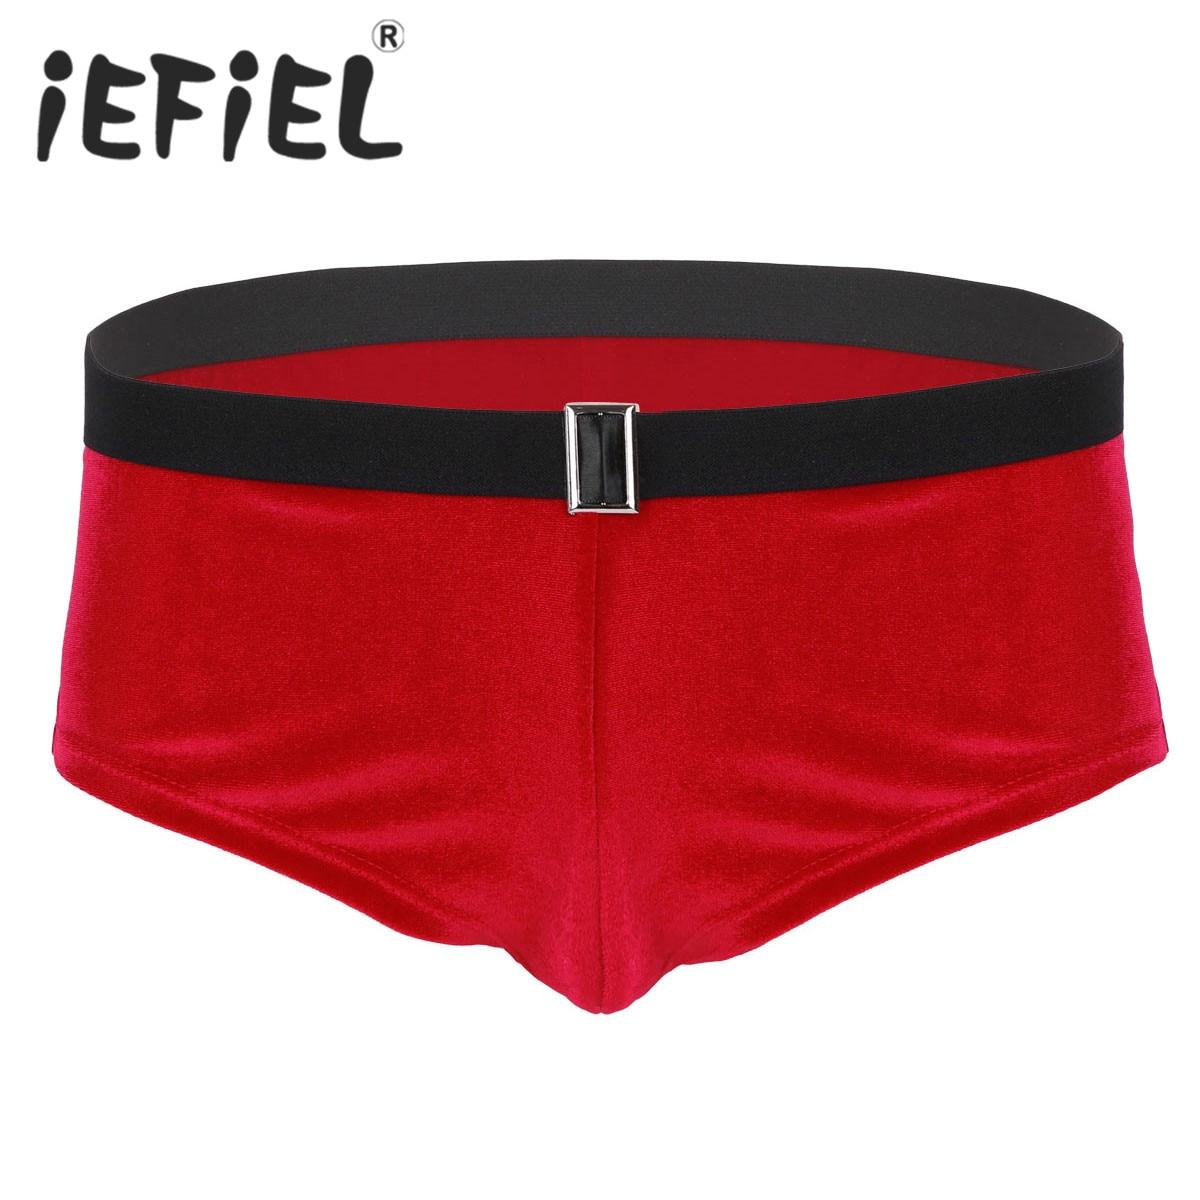 CHICTRY Mens Boxer Shorts Red Velvet Santa Bikini Panties Low Rise Underwear